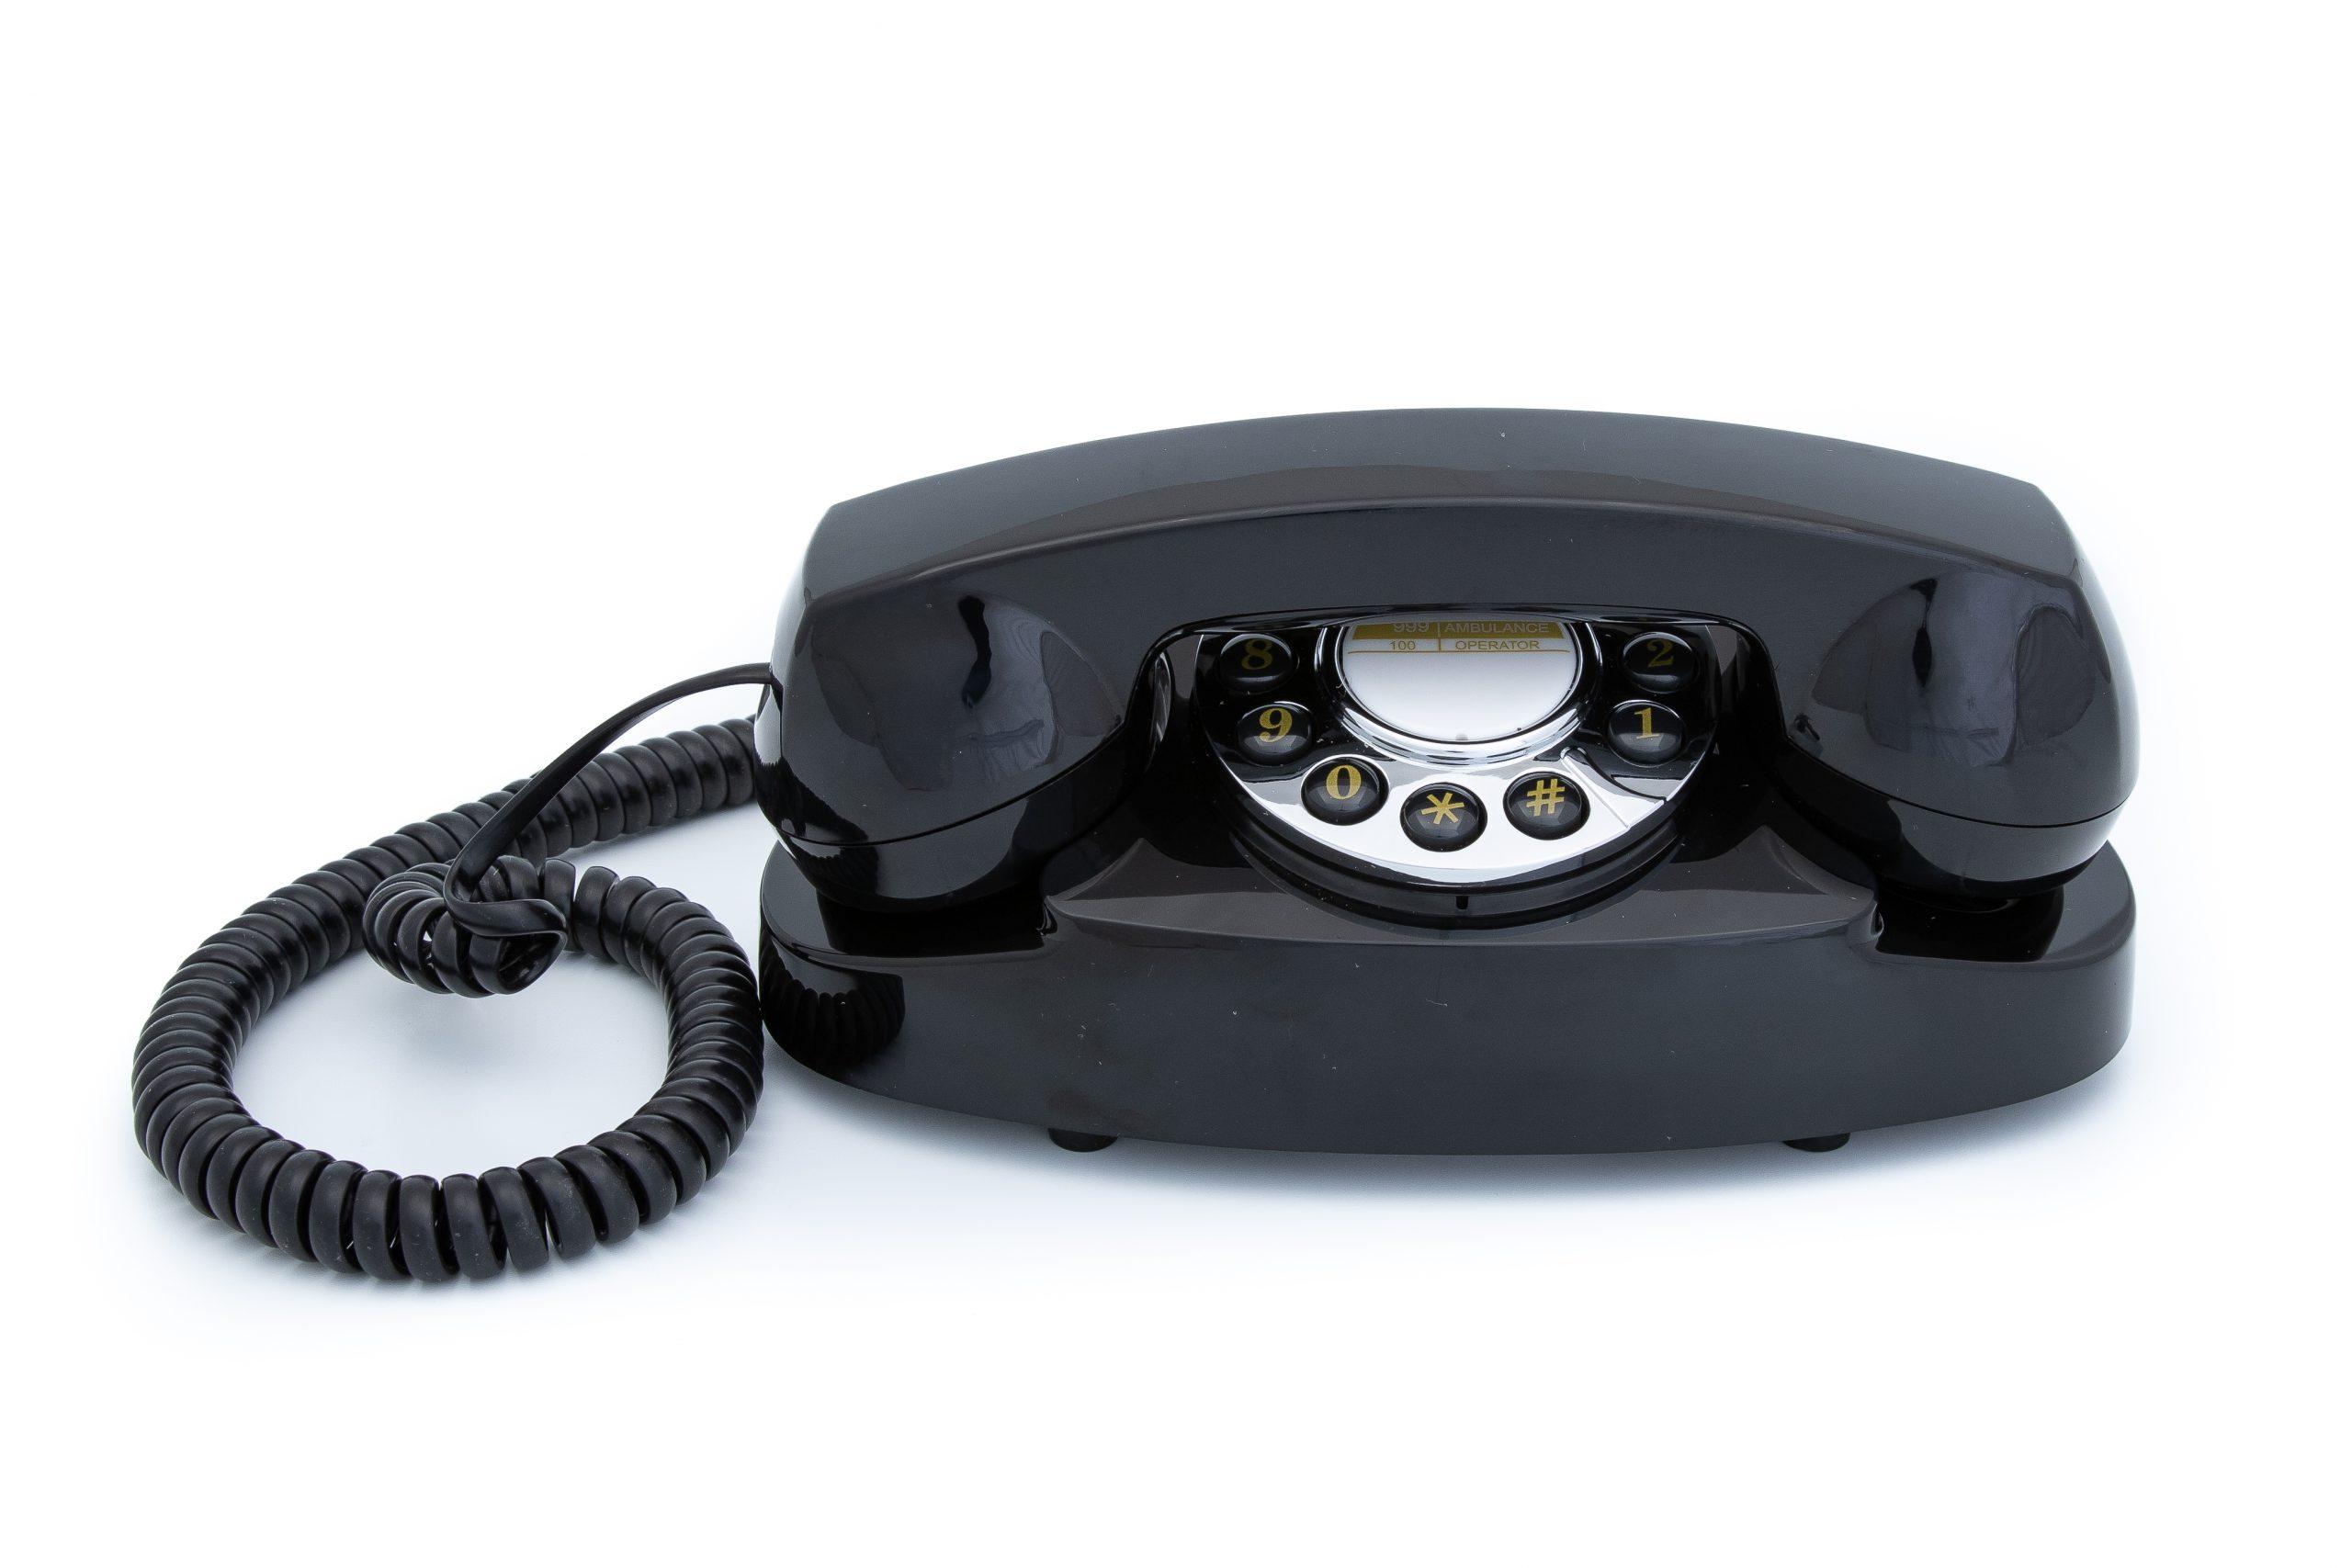 Retro Hospitality Phones and Audio Equipment